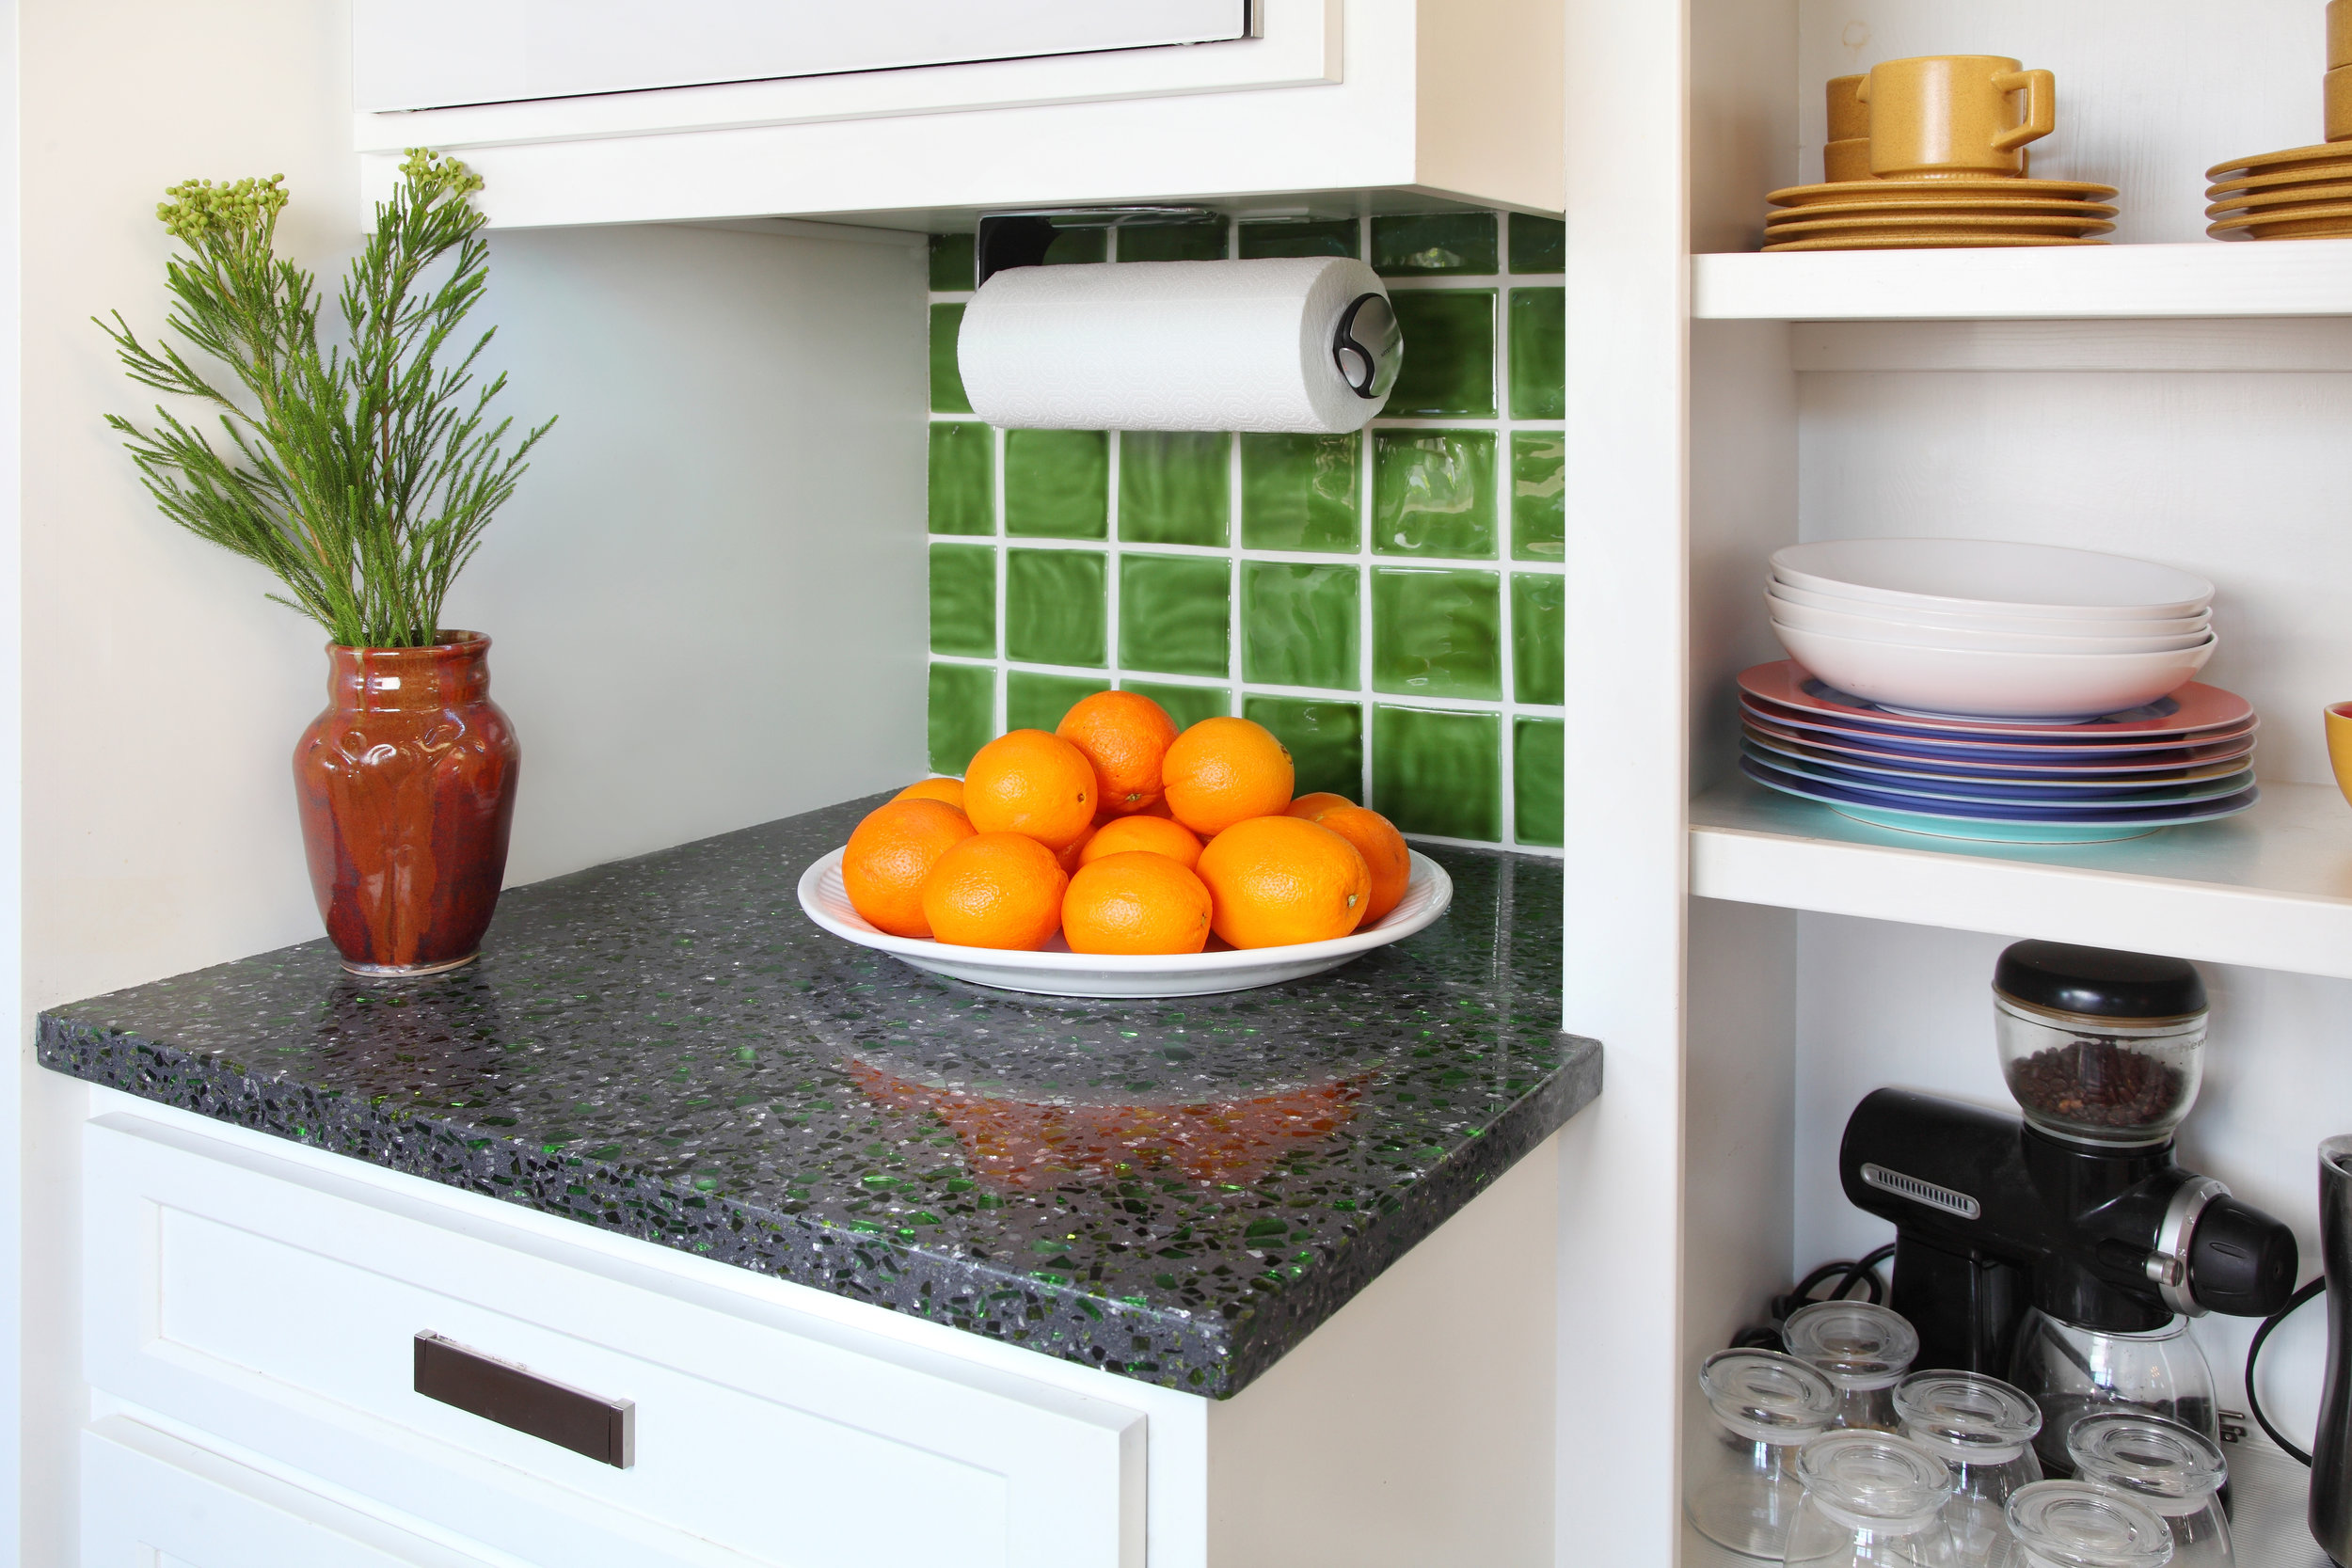 Sarah-barnard-design-modern-recycled-kitchen-detail.jpg